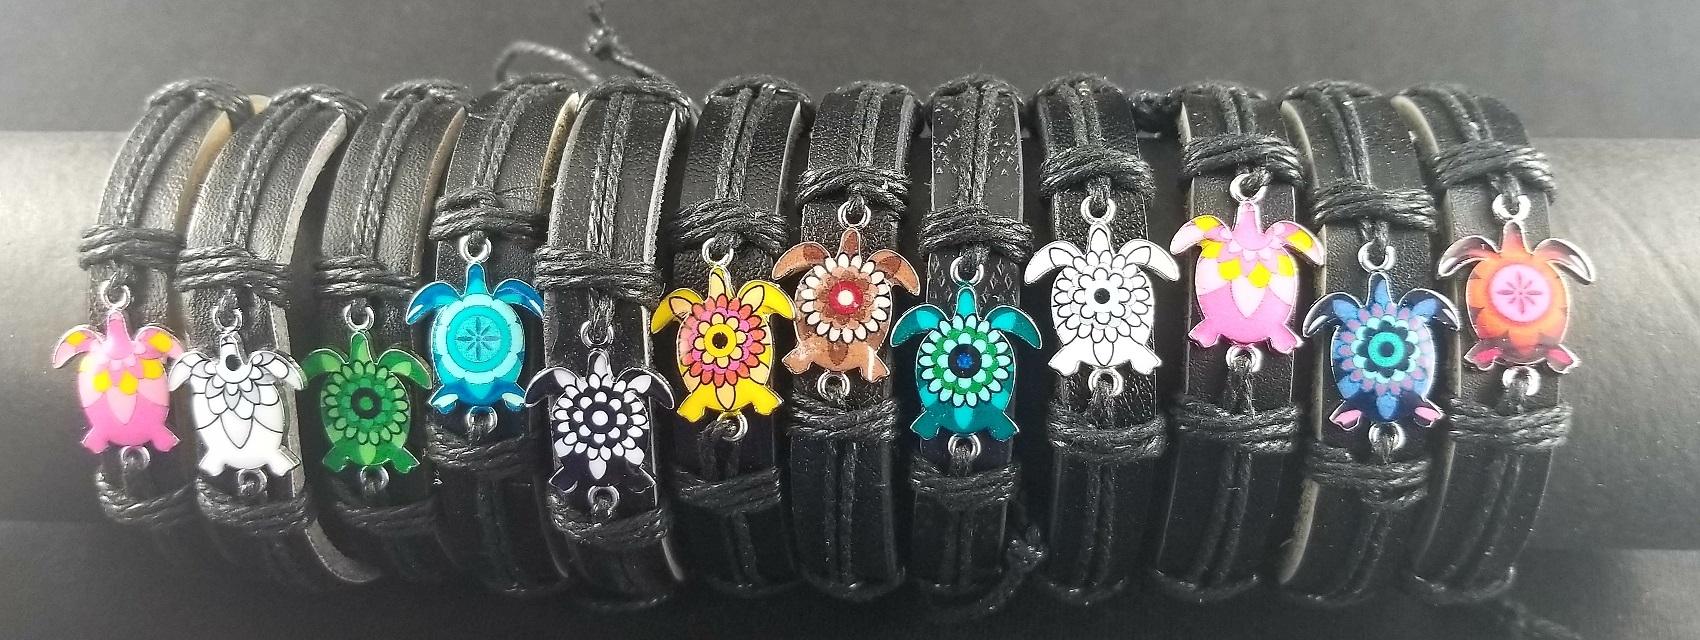 Fashion - Jewelry - Turtle Leather Band BRACELETs YBT-2784 (SOLD BY THE DOZEN)